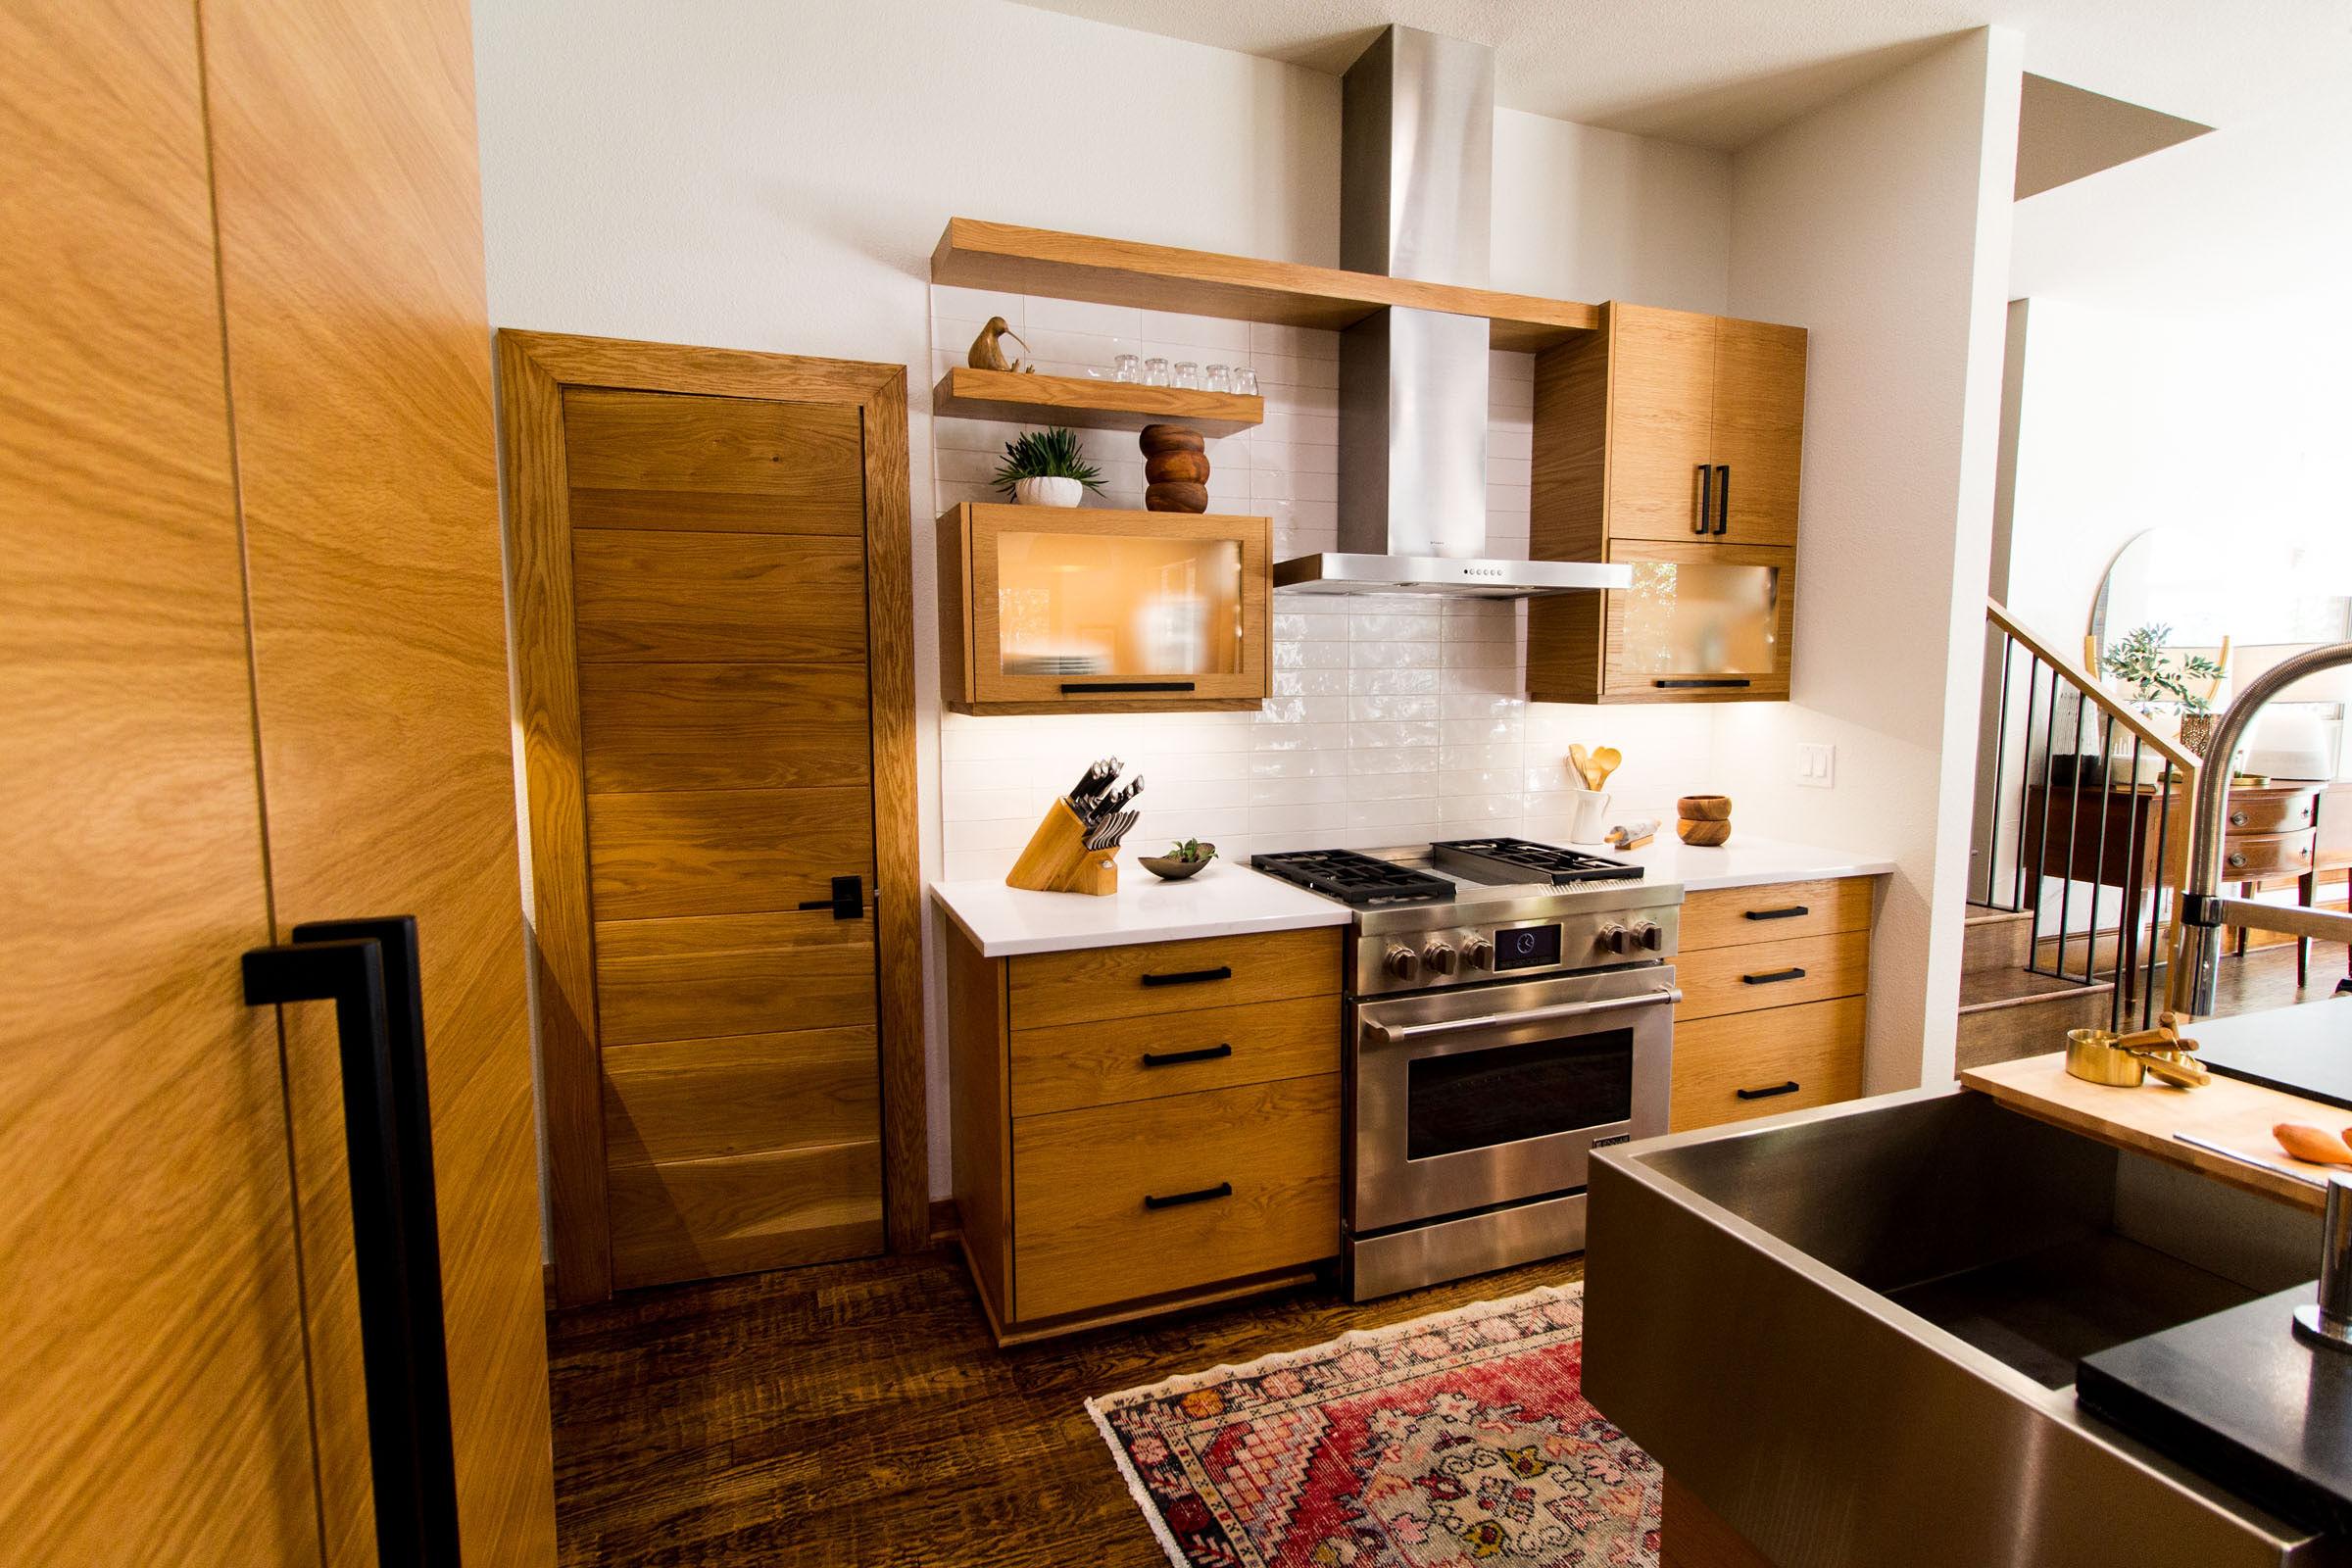 Stainless steel cooktop, blonde cabinets, scandinavian decor